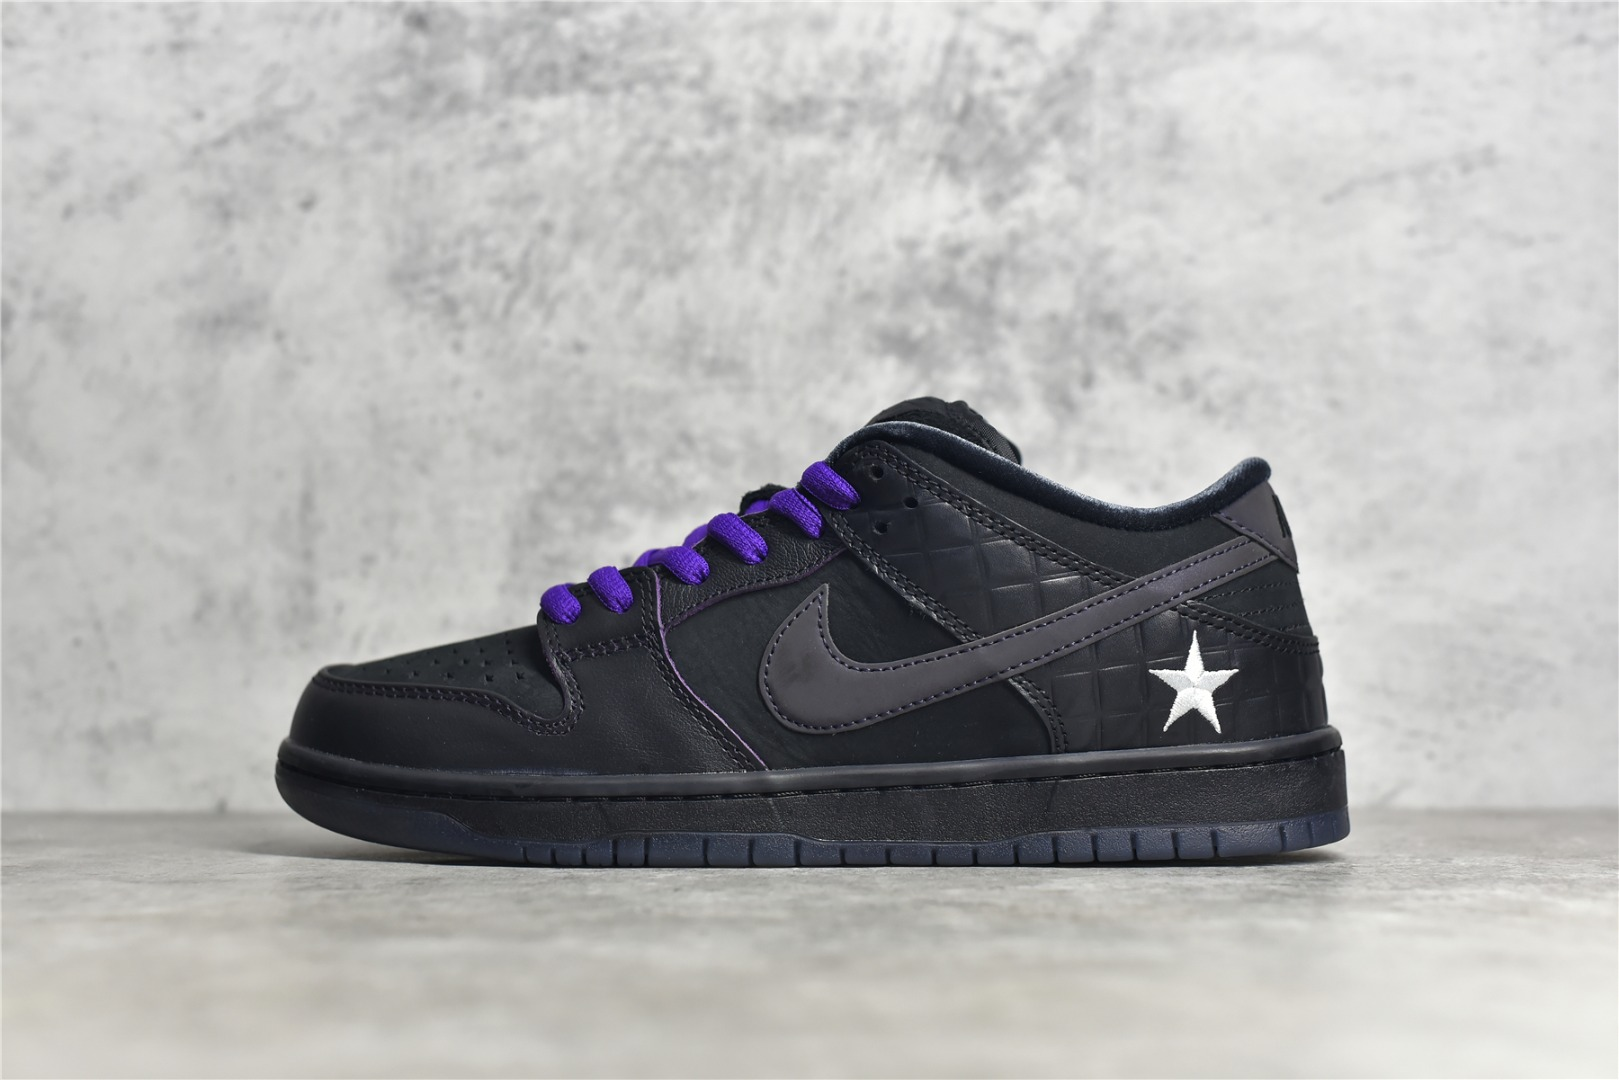 耐克SB Dunk Familia联名款 Familia x Nike SB Dunk Low 耐克Dunk SB 3M反光黑色低帮 货号:DJ1159-001-潮流者之家